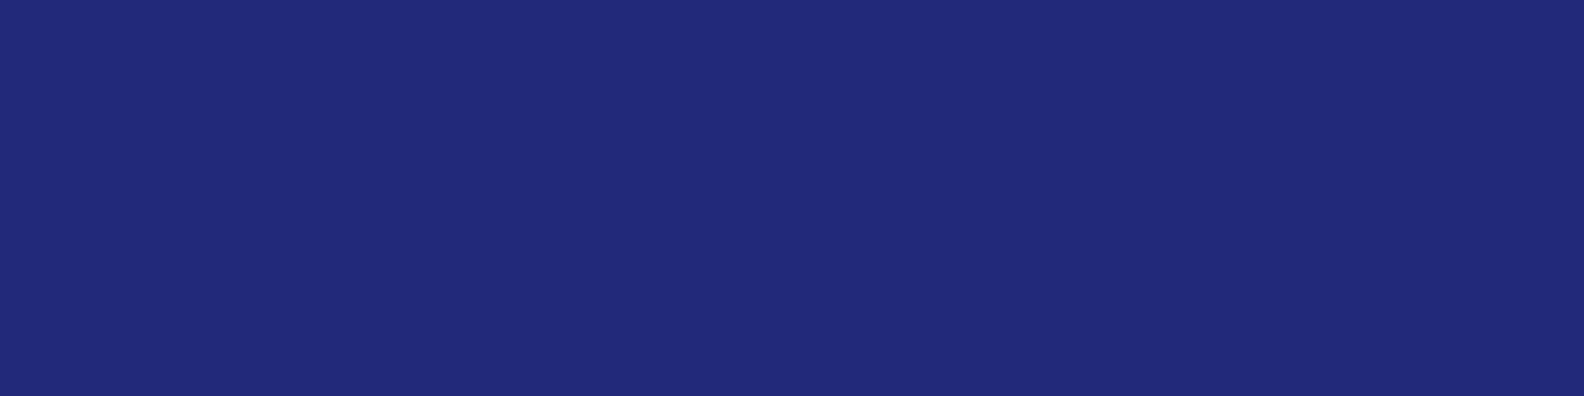 1584x396 St Patricks Blue Solid Color Background